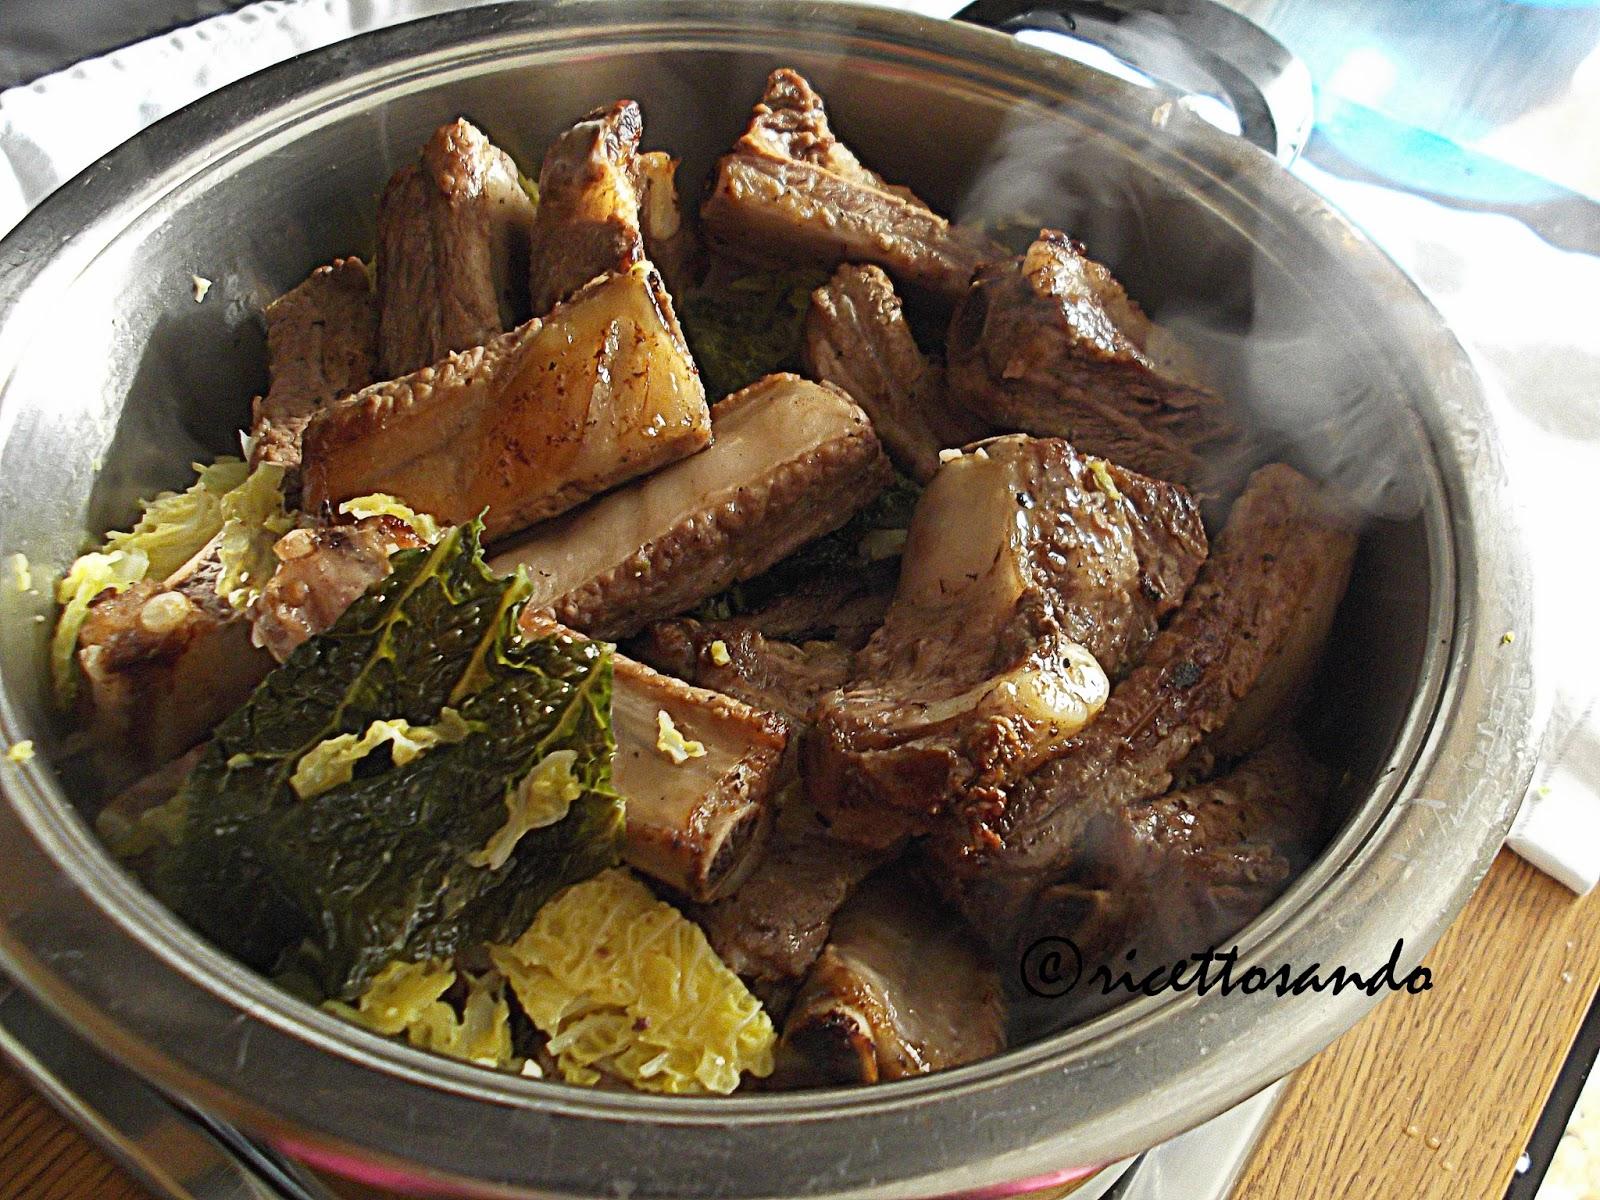 Cassoeula bergamasca ricetta tradizionale di verza, cotechine e costine